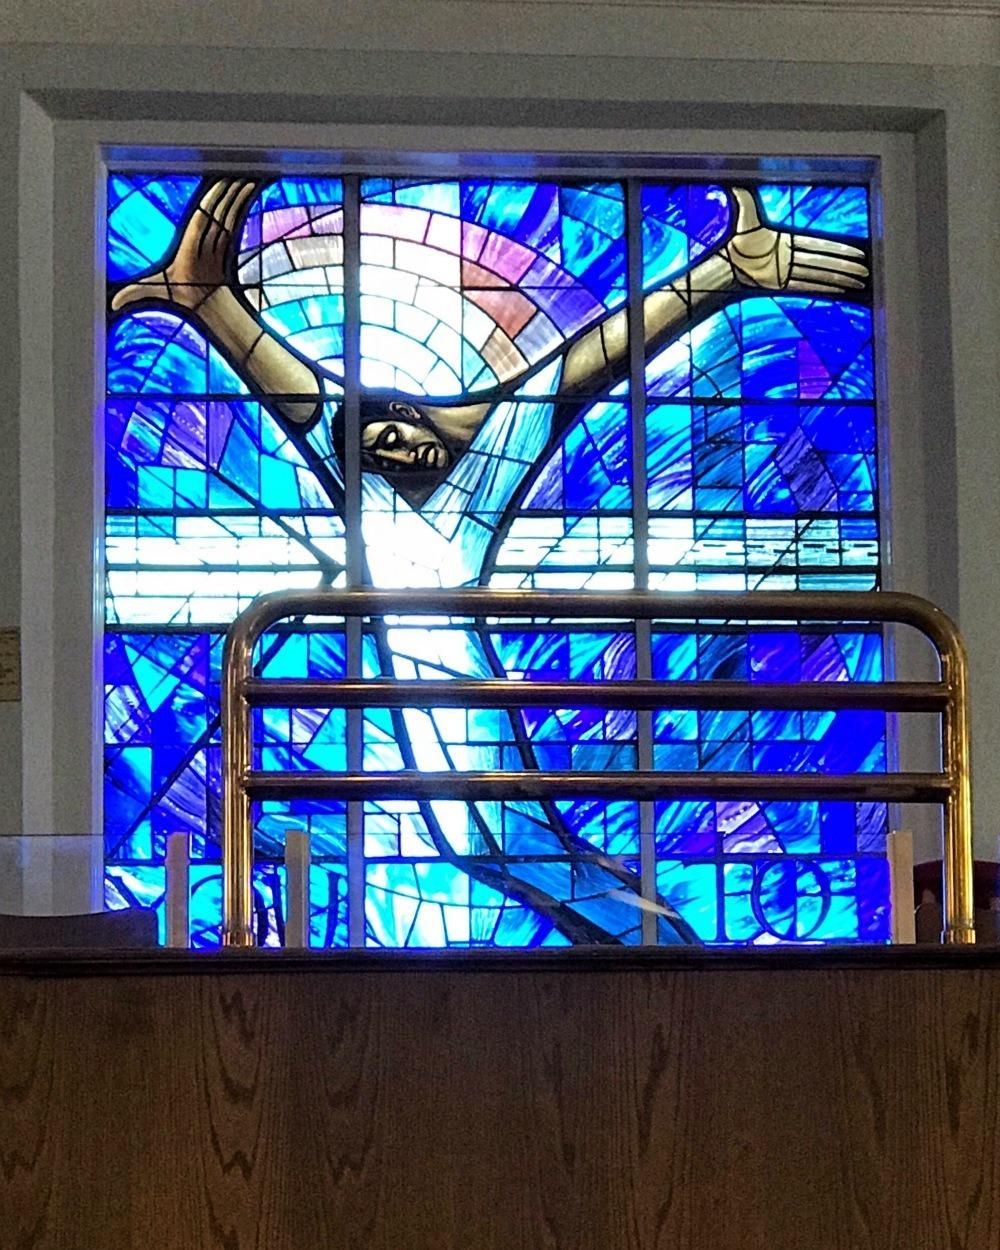 Stained glass window in 16th St Baptist Church, Birmingham, Alabama Photo Heatheronhertravels.com